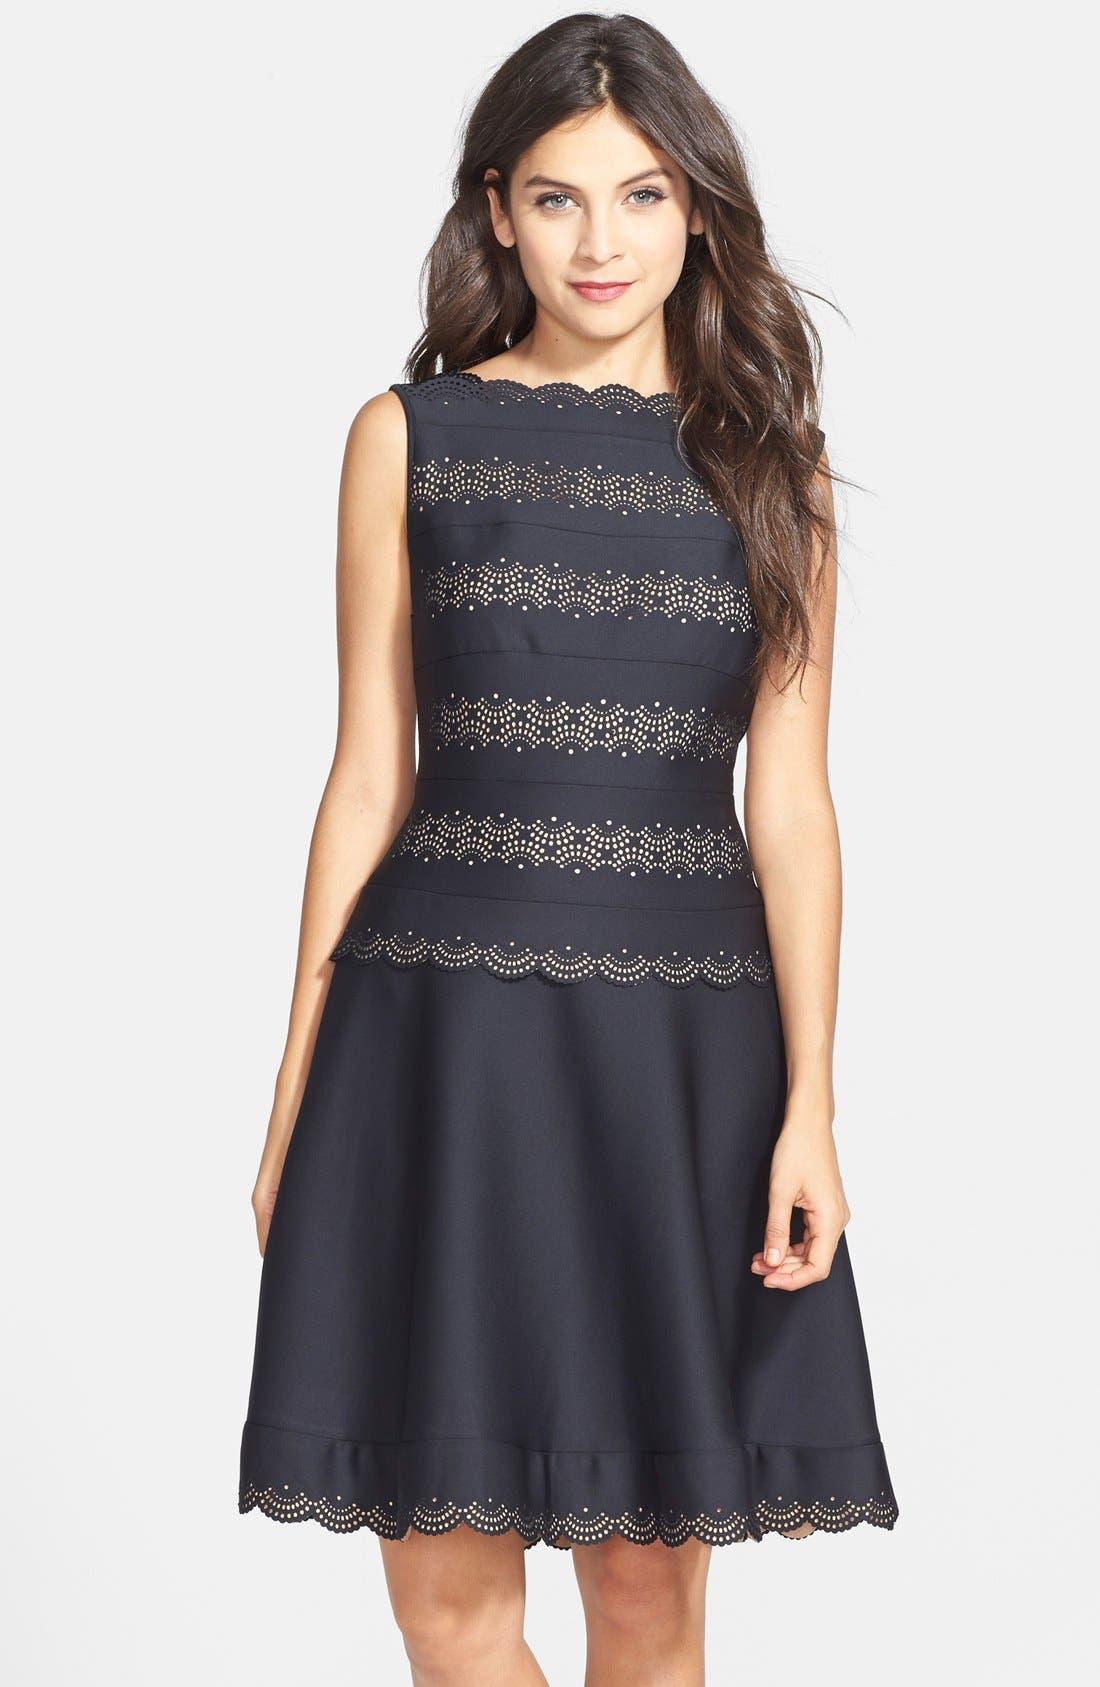 Alternate Image 1 Selected - Tadashi Shoji Laser Cut Neoprene Fit & Flare Dress